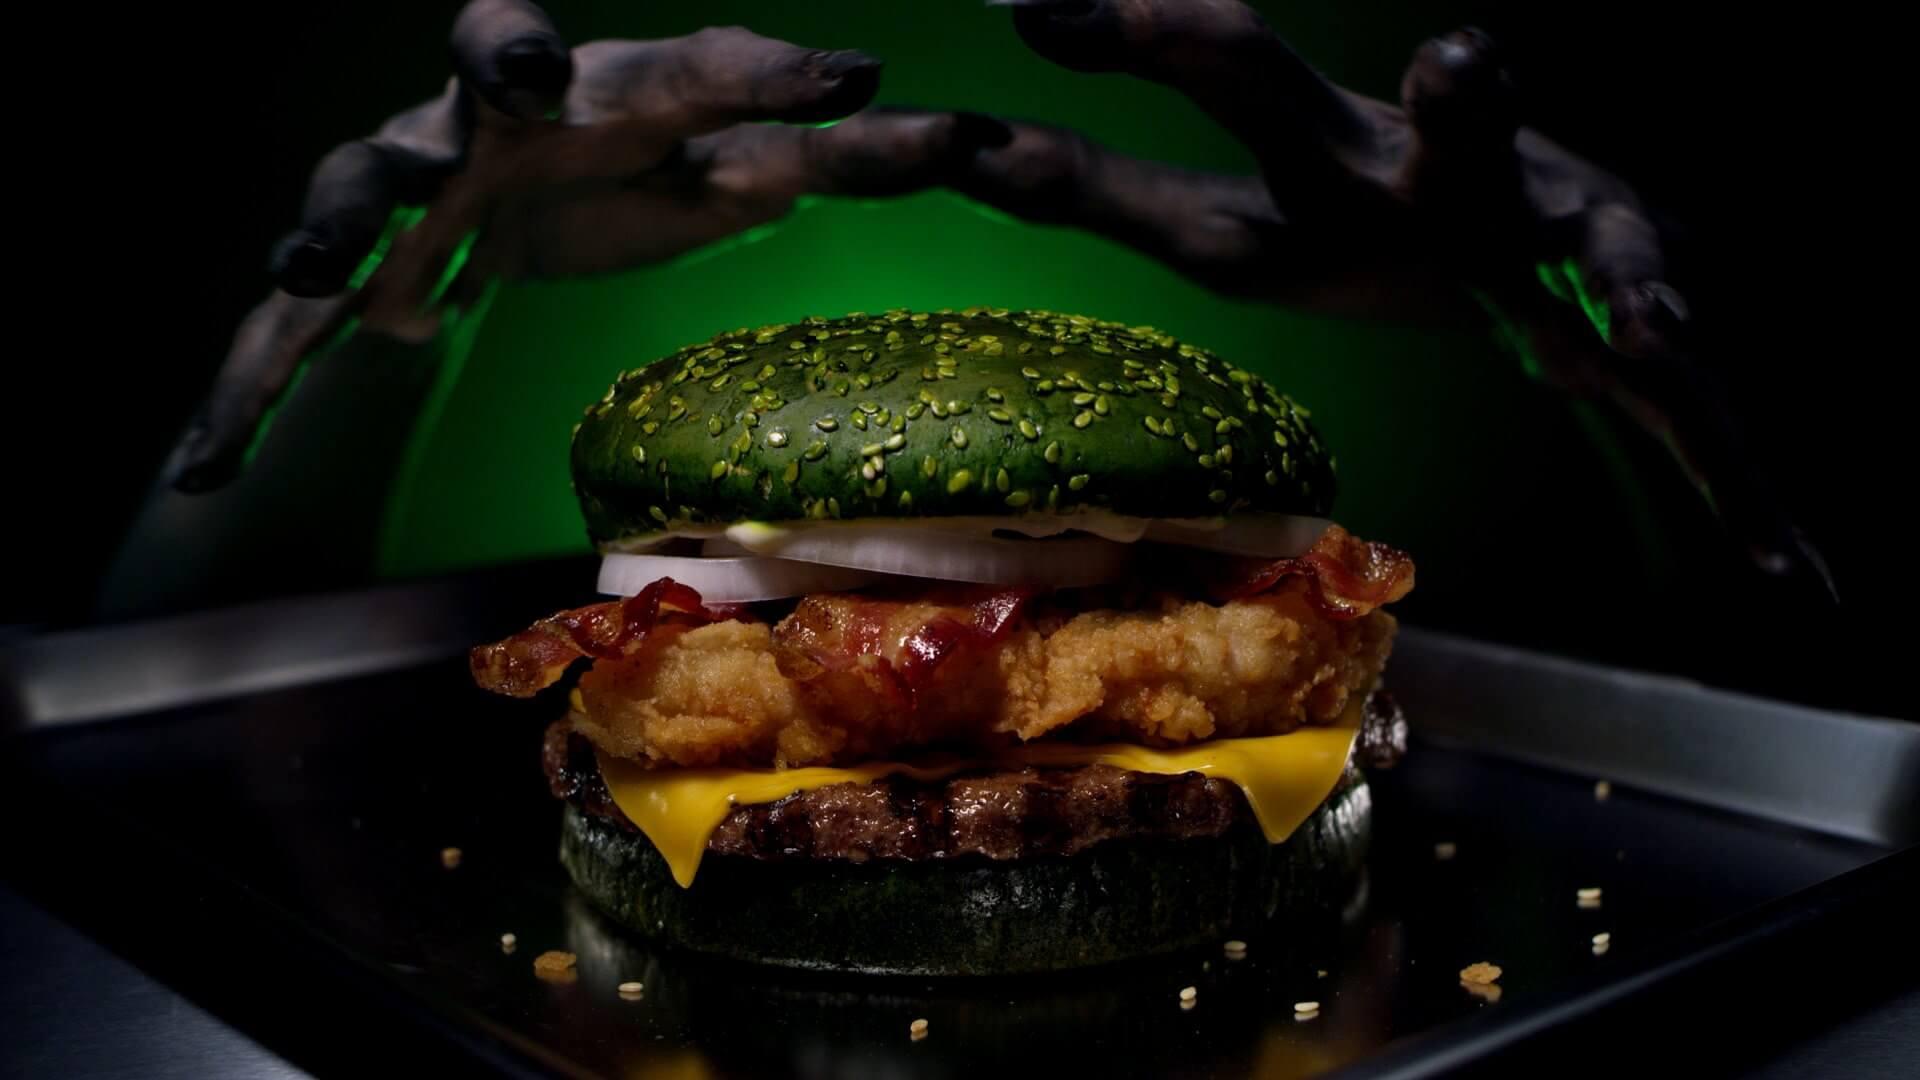 nightmare king hanburguesa halloween burger king